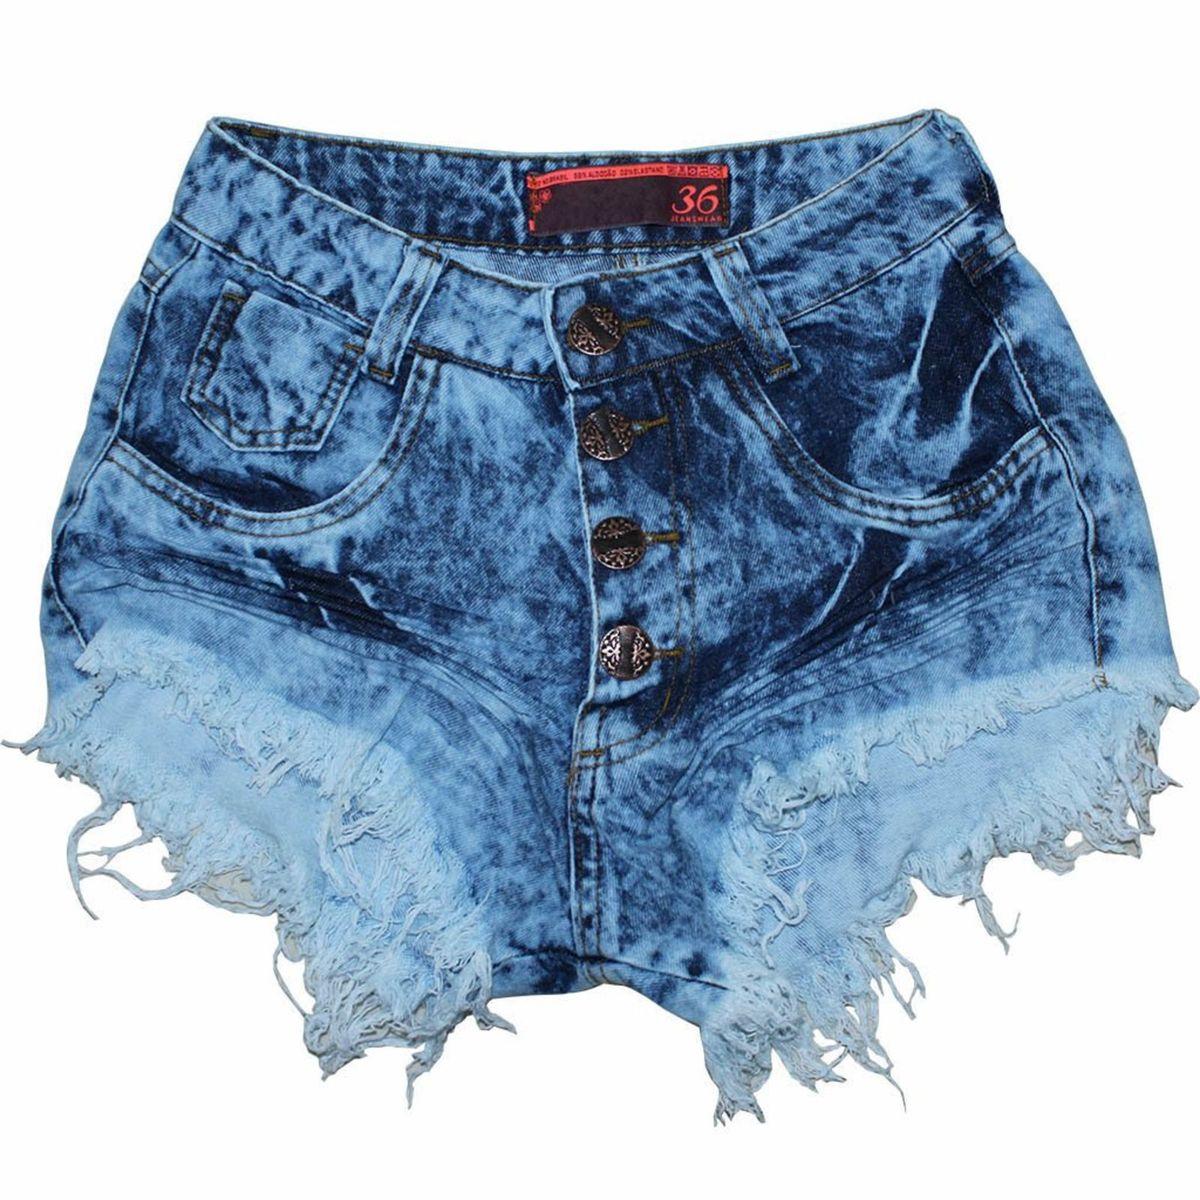 6f3d9f0c7 Shorts Jeans Cintura Alta Desfiado Hot Pants Diversos Botões | Shorts  Feminino Lilies Nunca Usado 26170446 | enjoei